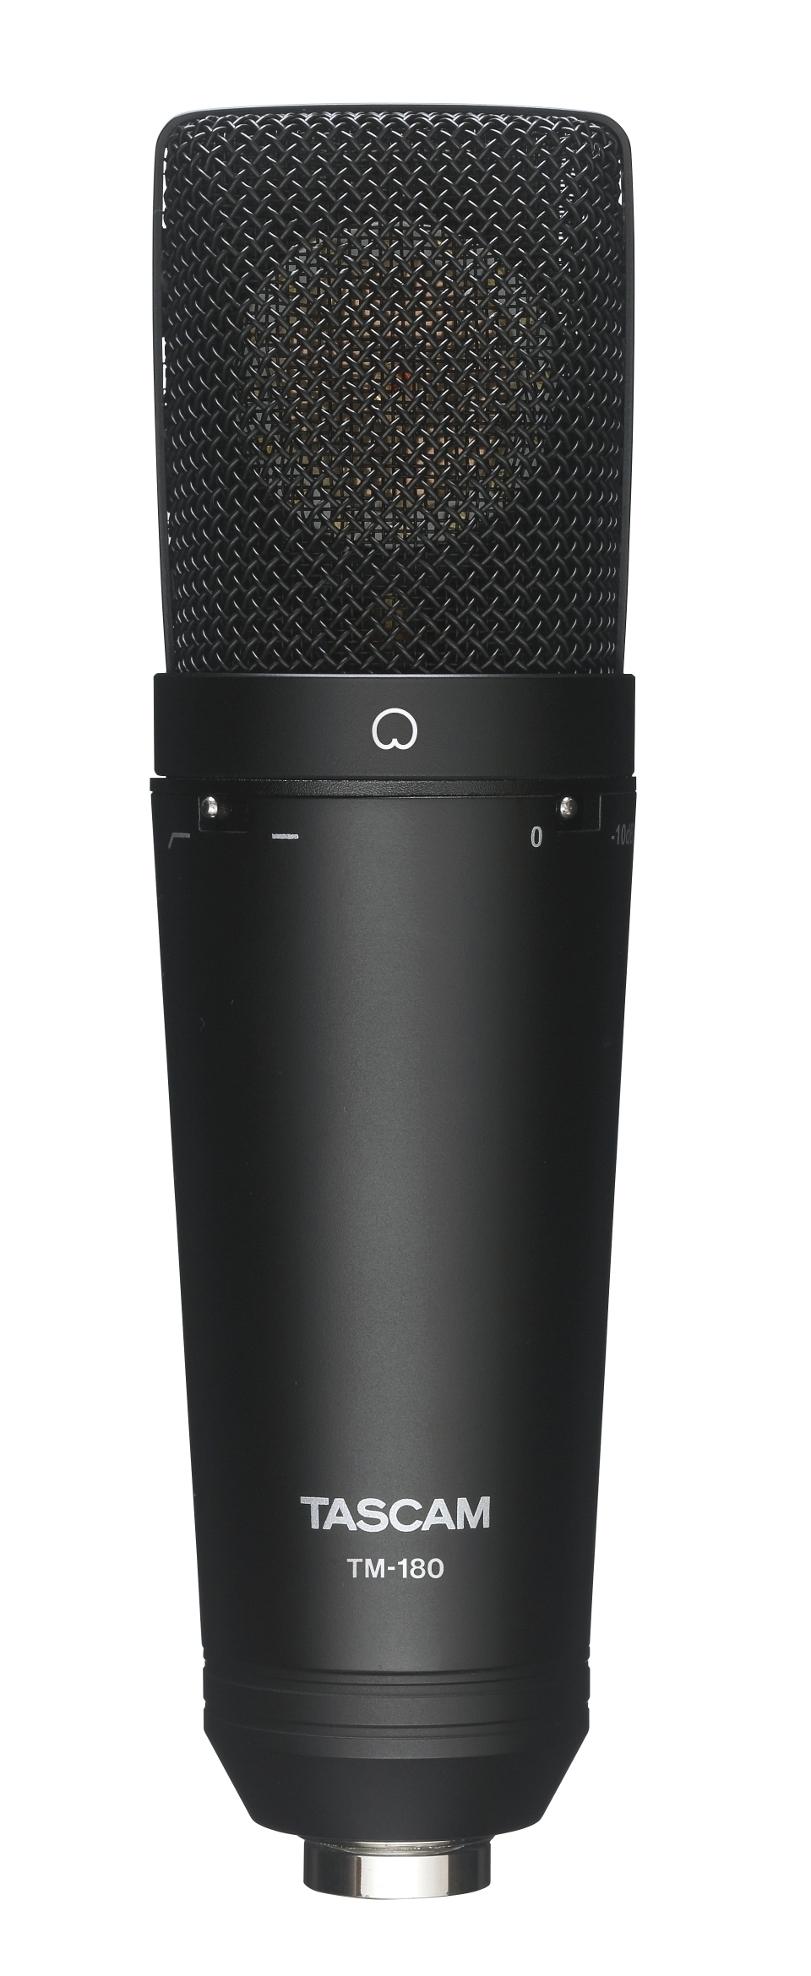 Tascam TM180 Condenser Microphone Instant Rebate